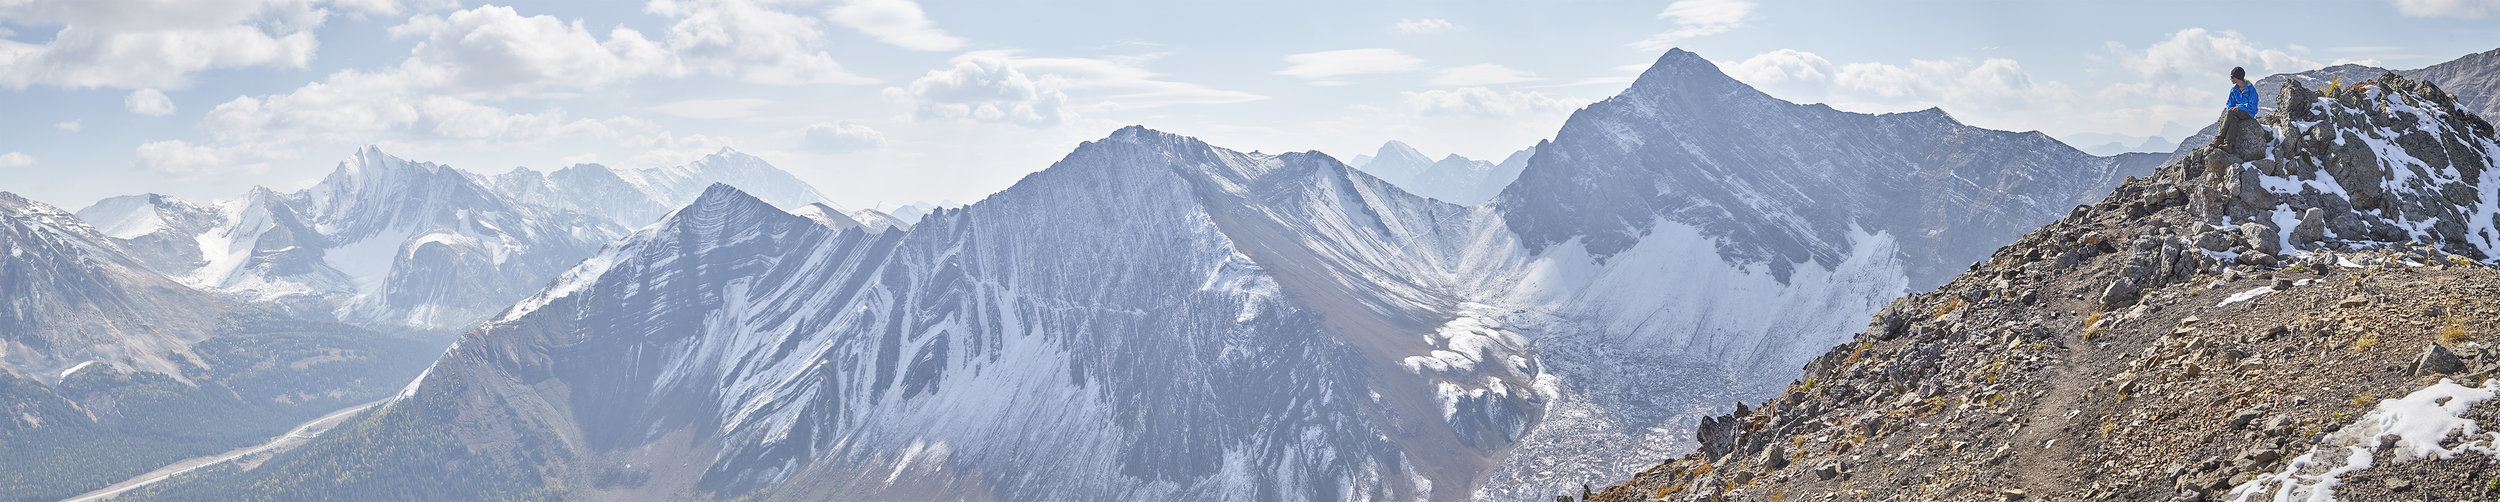 Yuri admires Highwood Ridge, Grizzly Ridge, and  Mount Tyrwhitt  from the summit of Pocaterra Ridge.